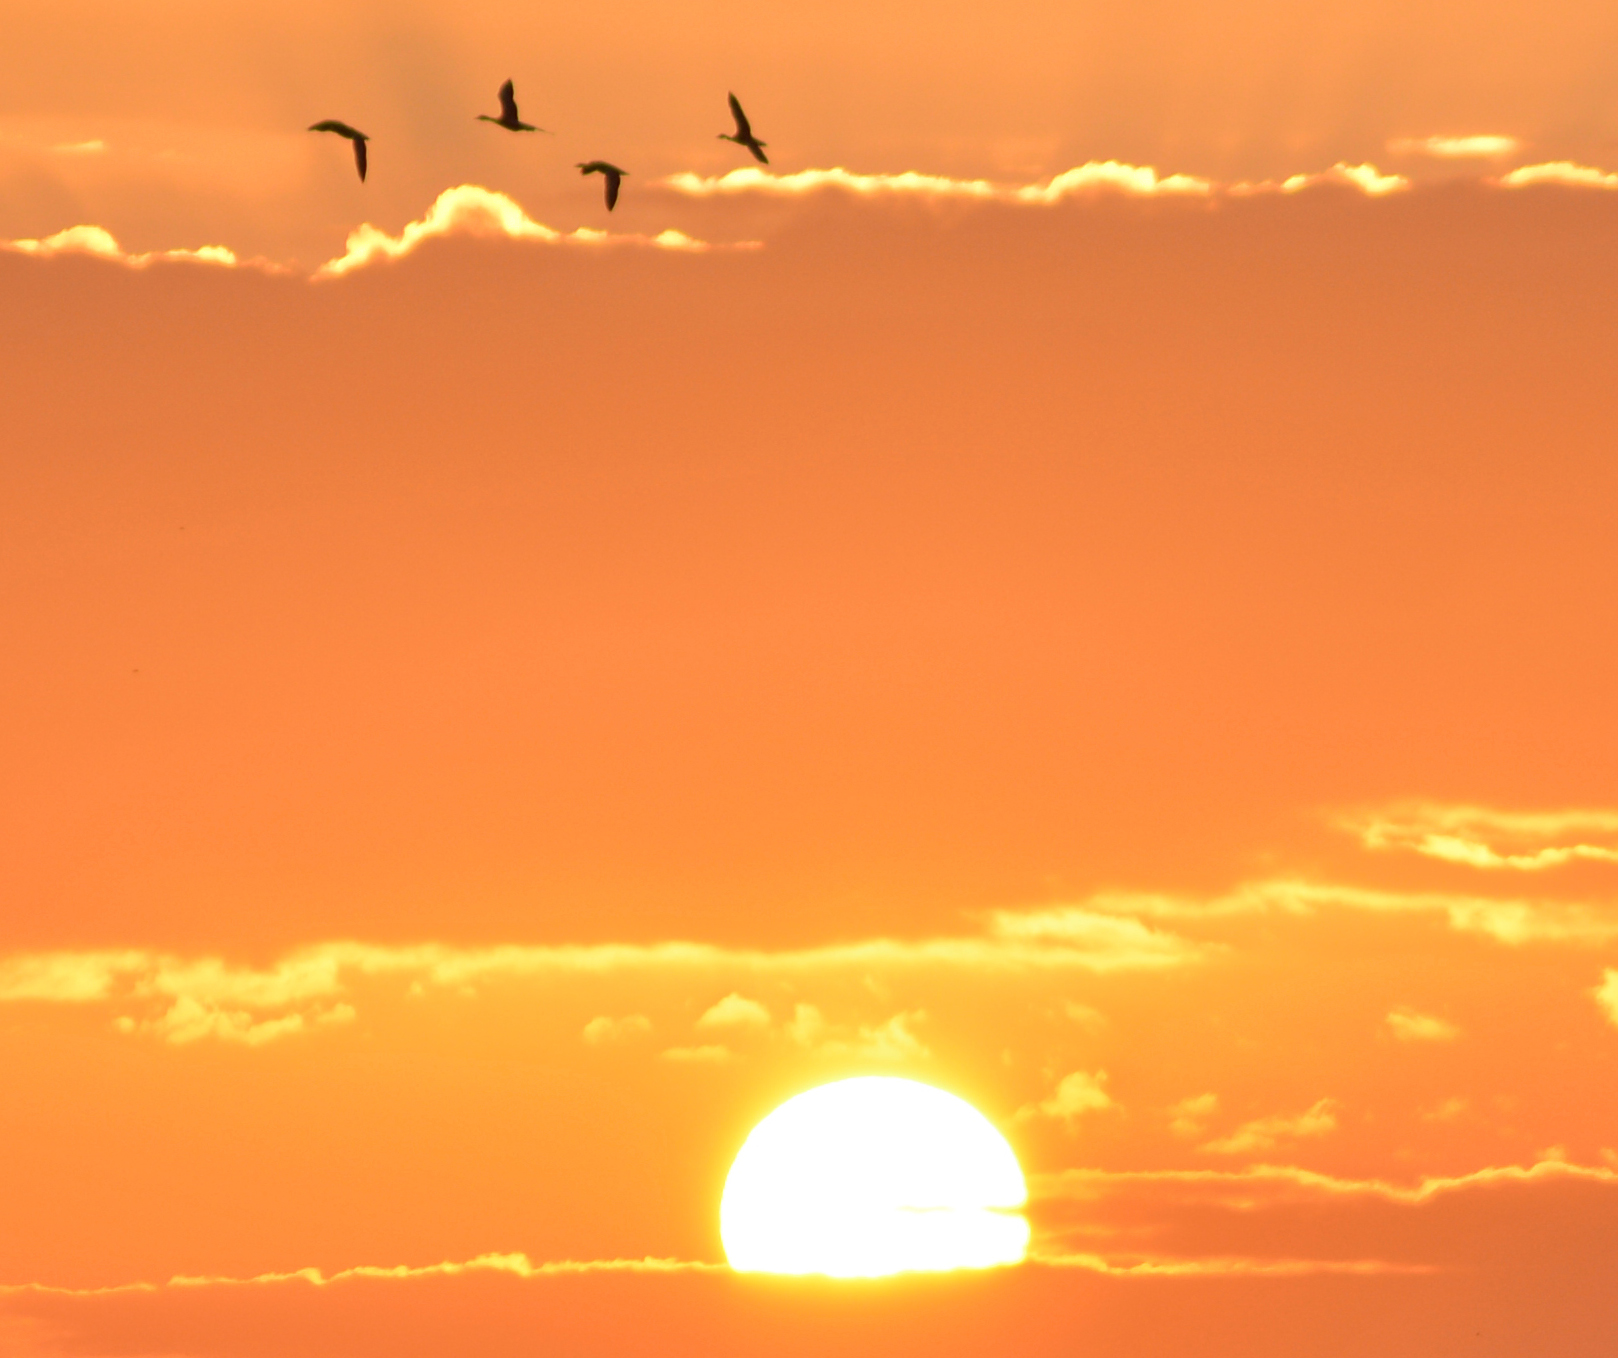 vogels bij zonsopgang